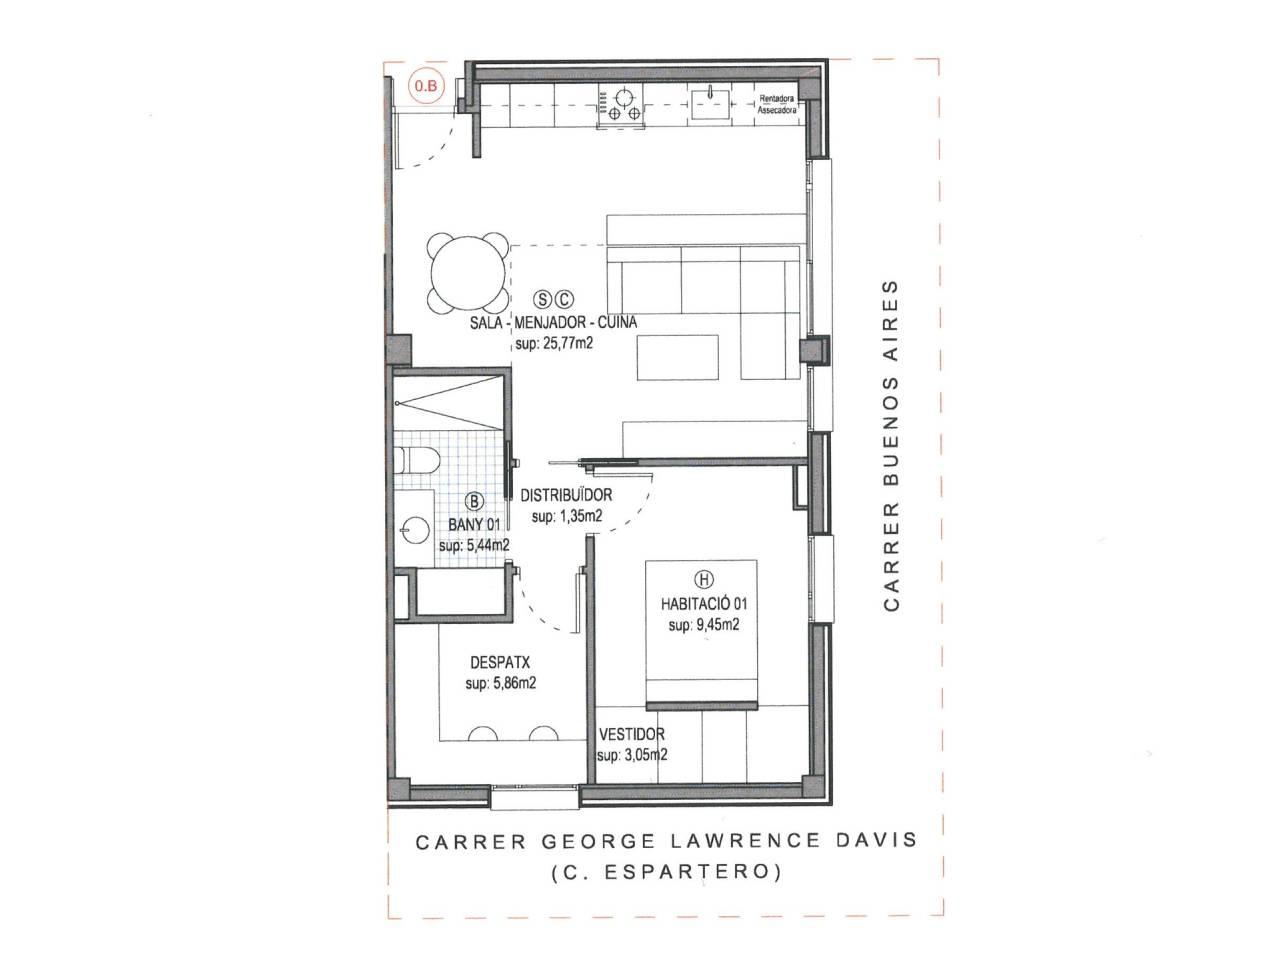 Lloguer Pis  Calle buenos aires. Superficie total 60 m², piso superficie útil 51 m², hab. individ